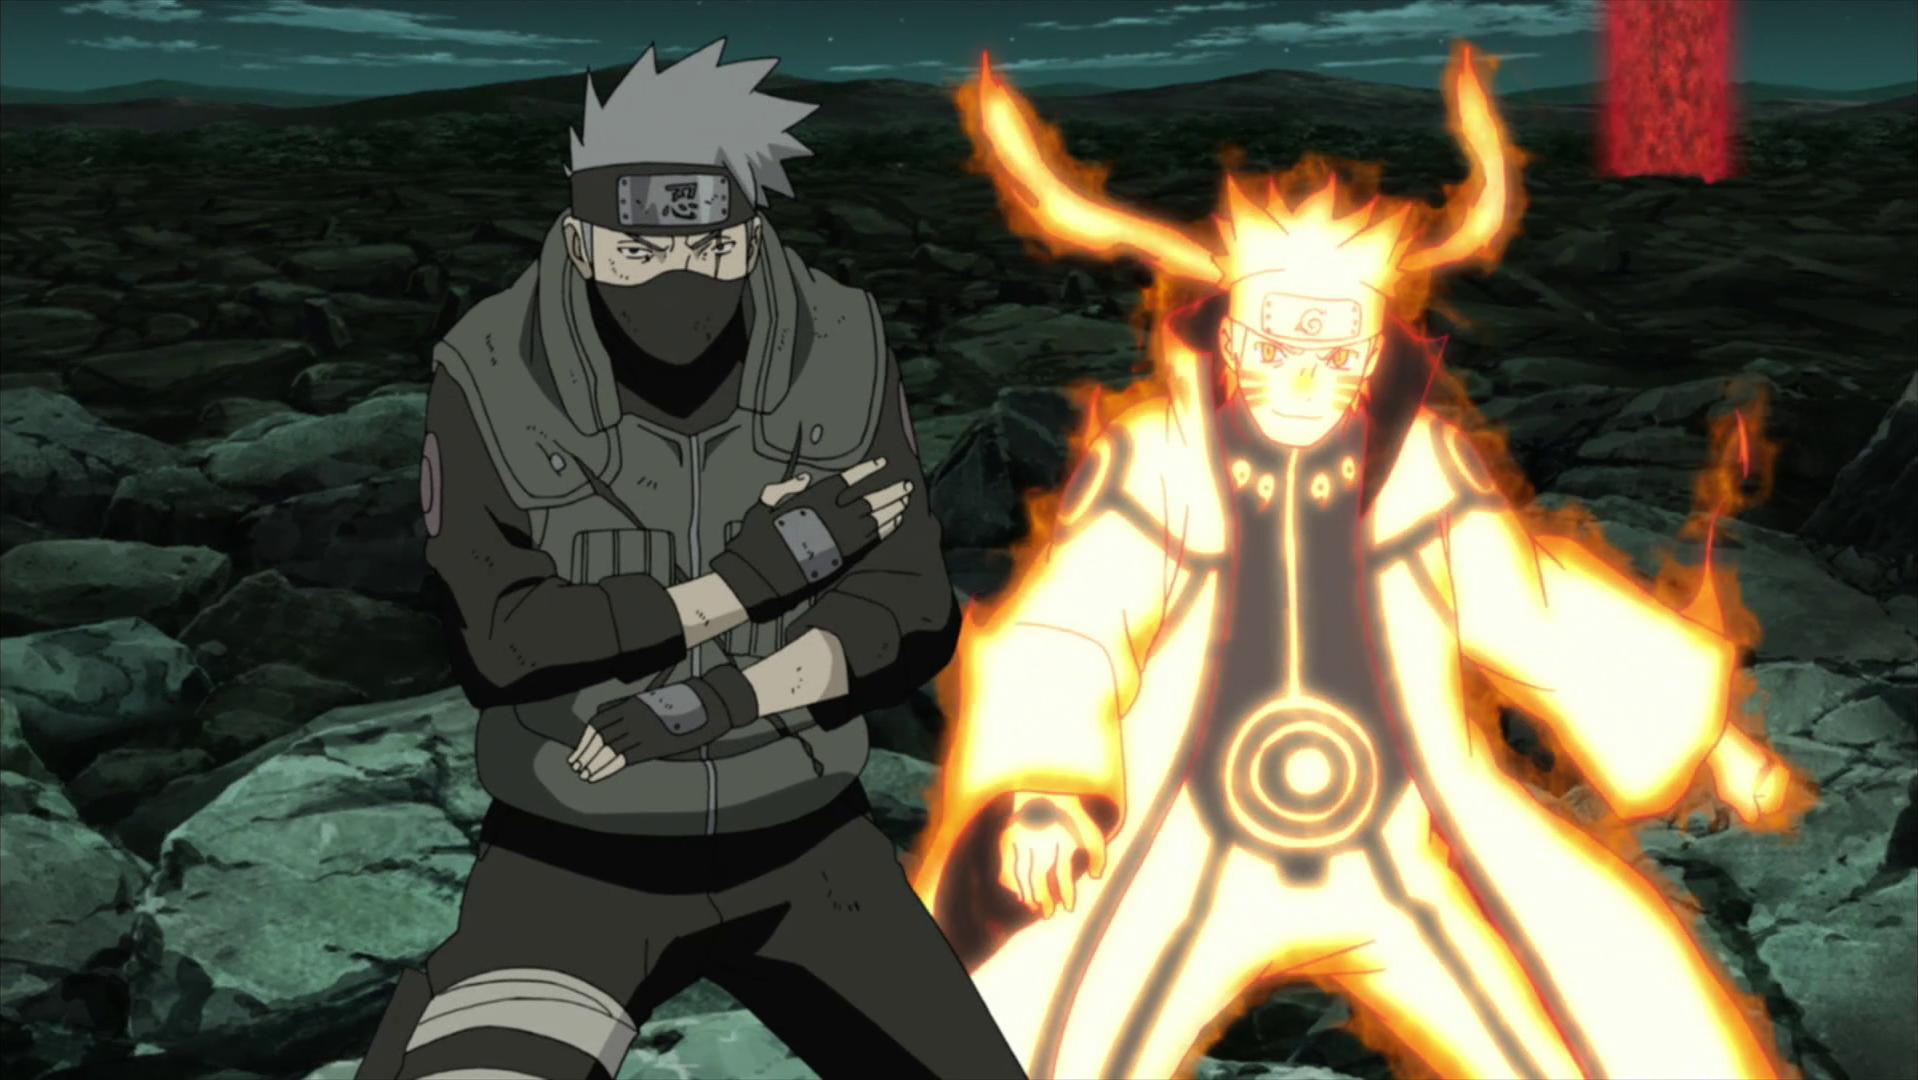 Kakashi's Resolve | Narutopedia | FANDOM powered by Wikia